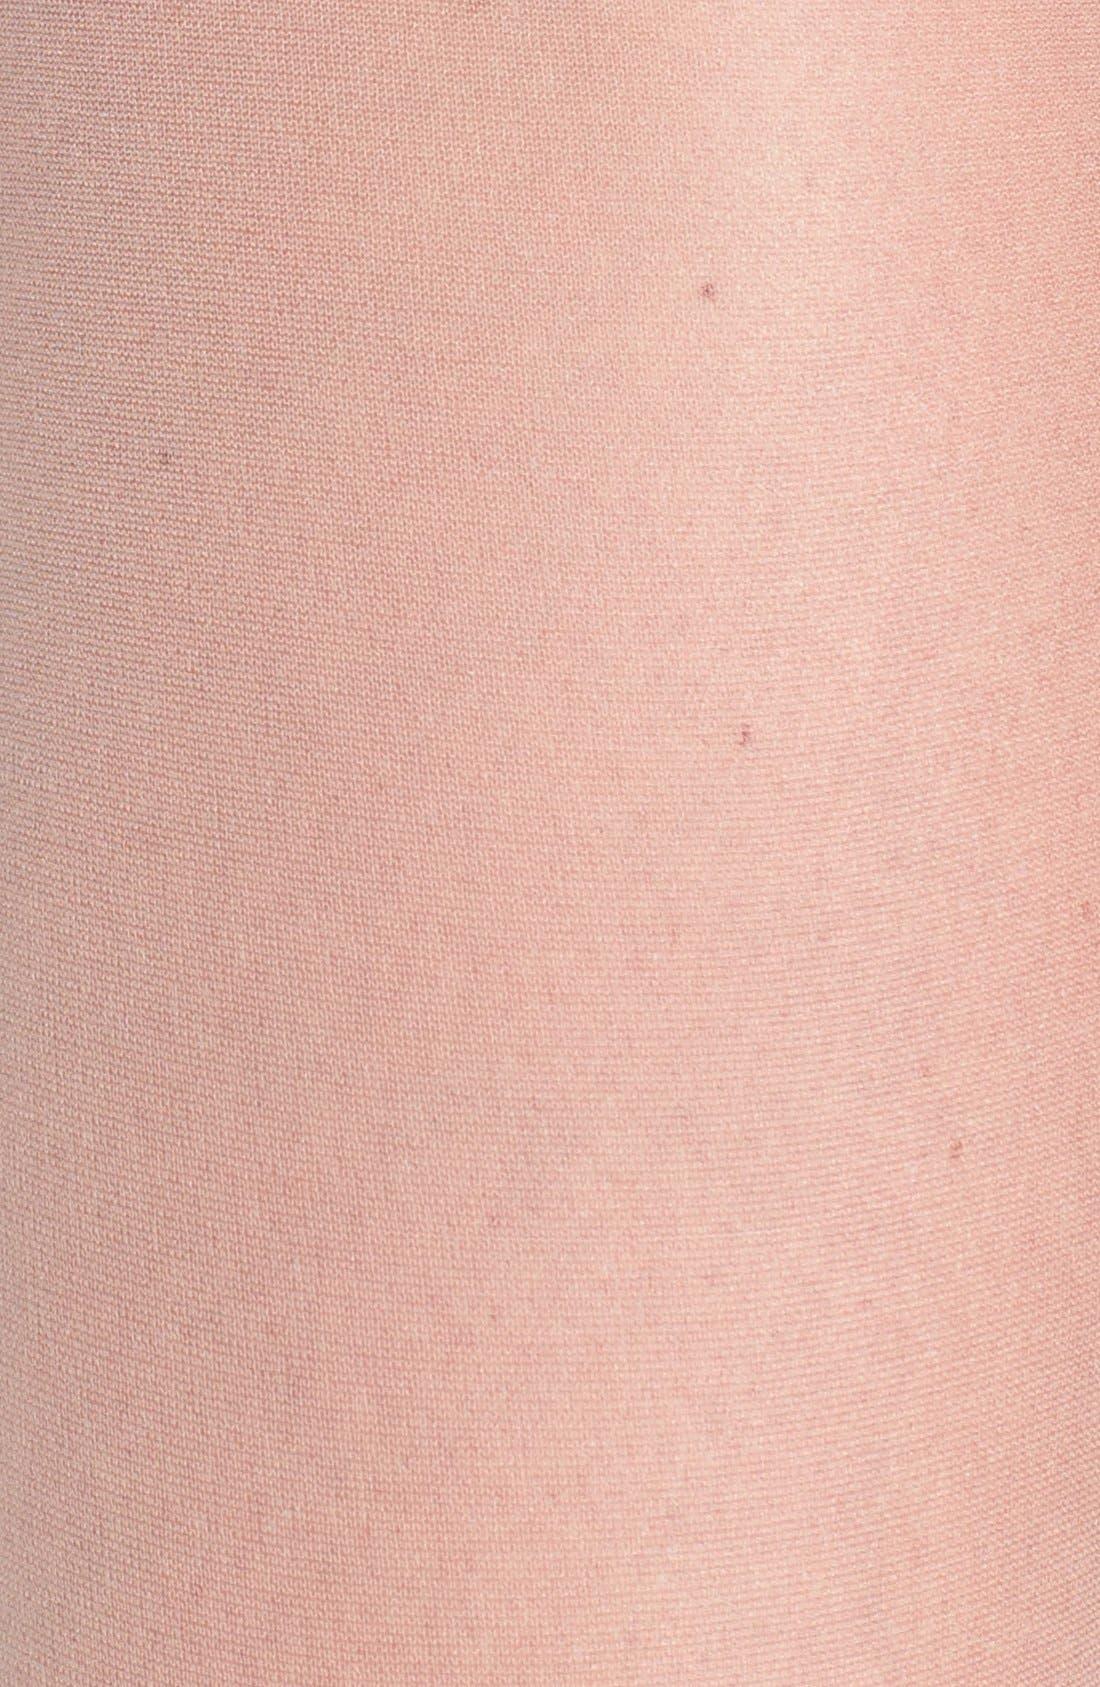 Donna Karan The Nudes Pantyhose,                             Alternate thumbnail 3, color,                             A01